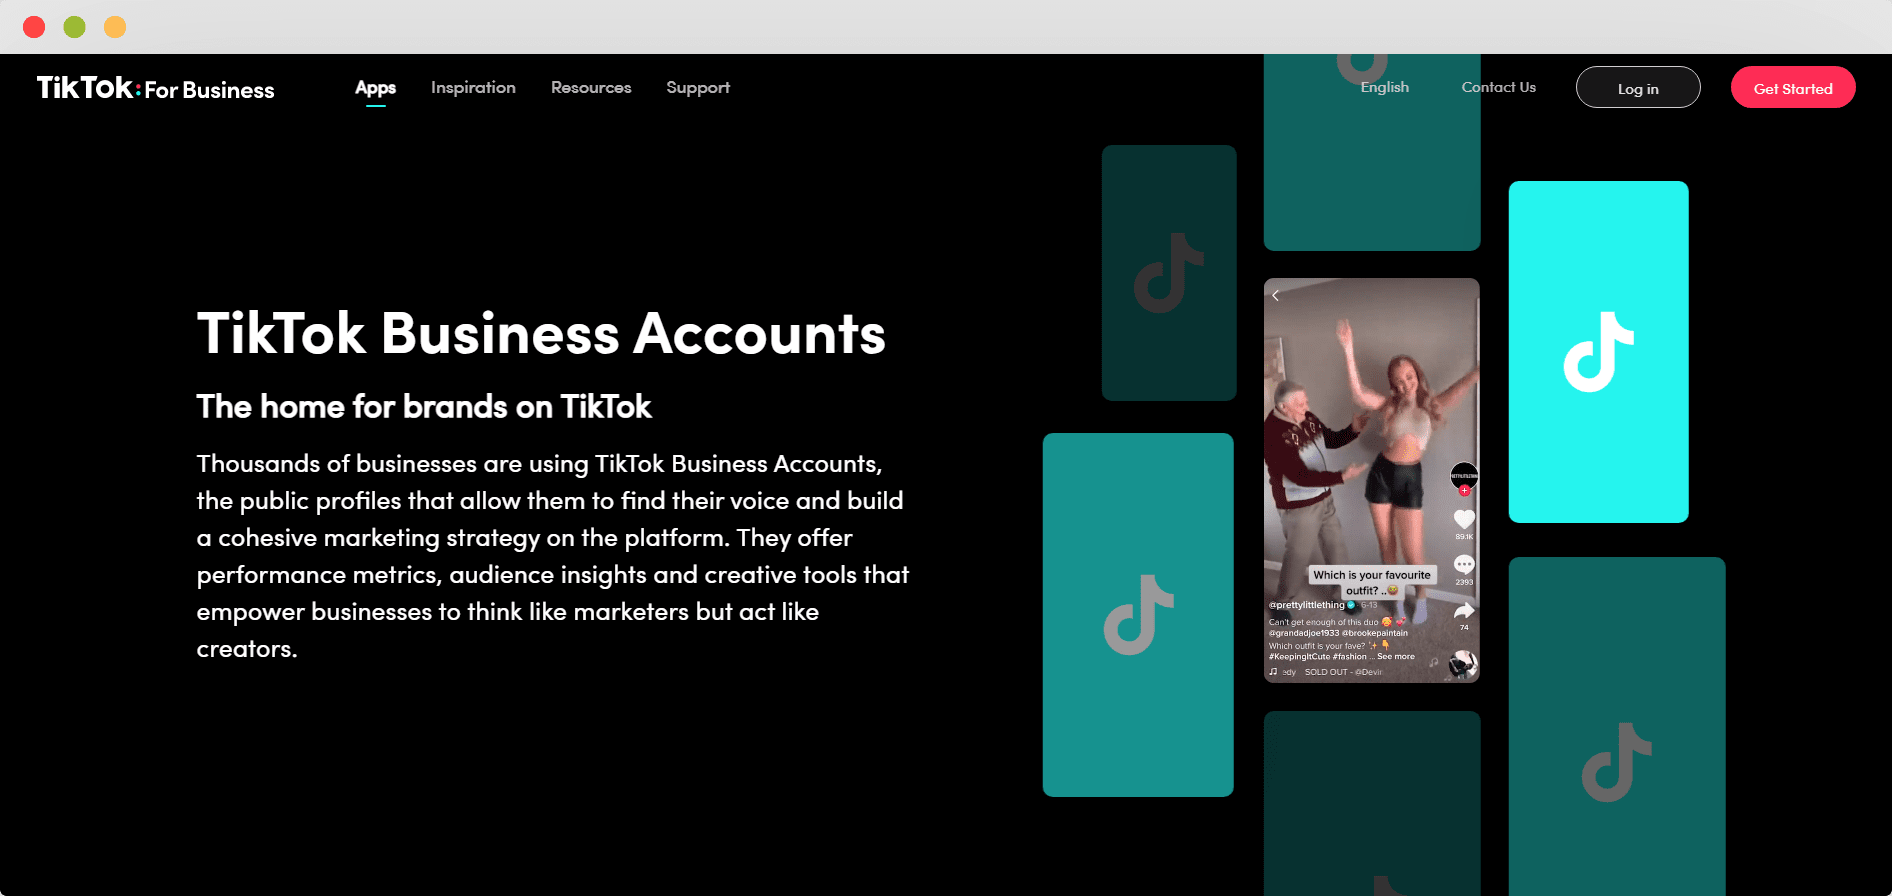 Tiktok Business Account